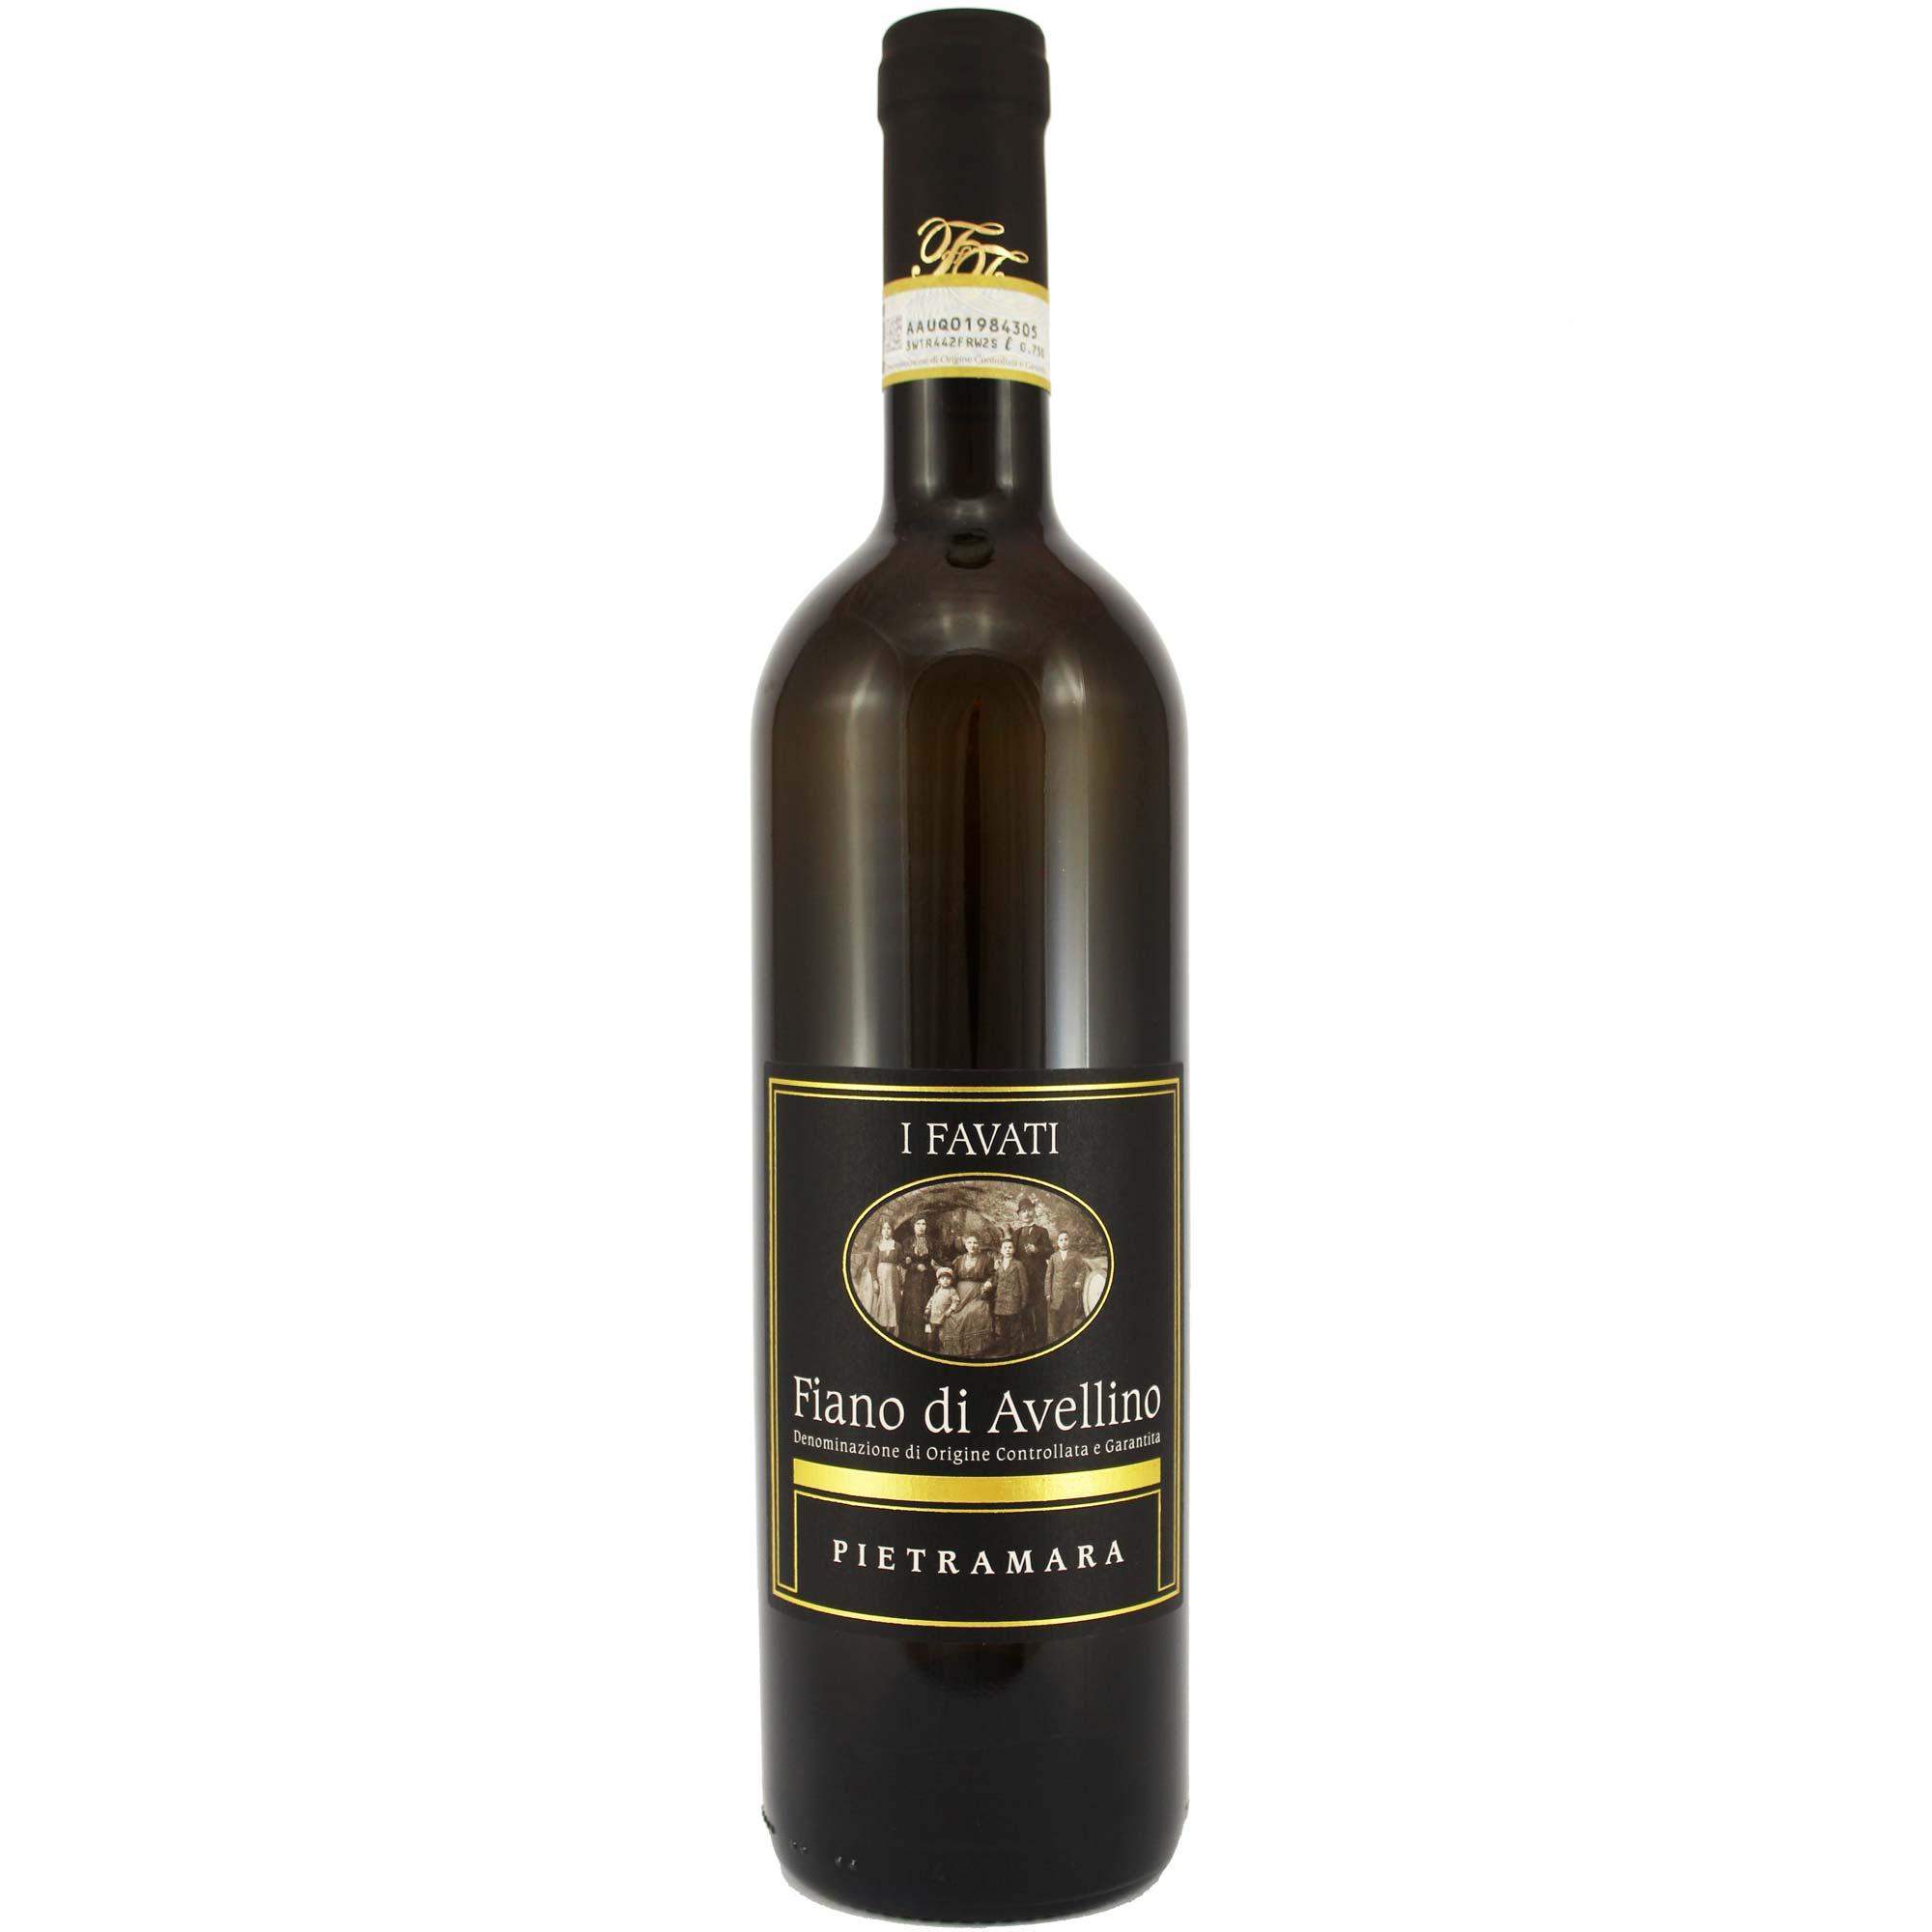 Vino bianco Fiano di Avellino Pietramara